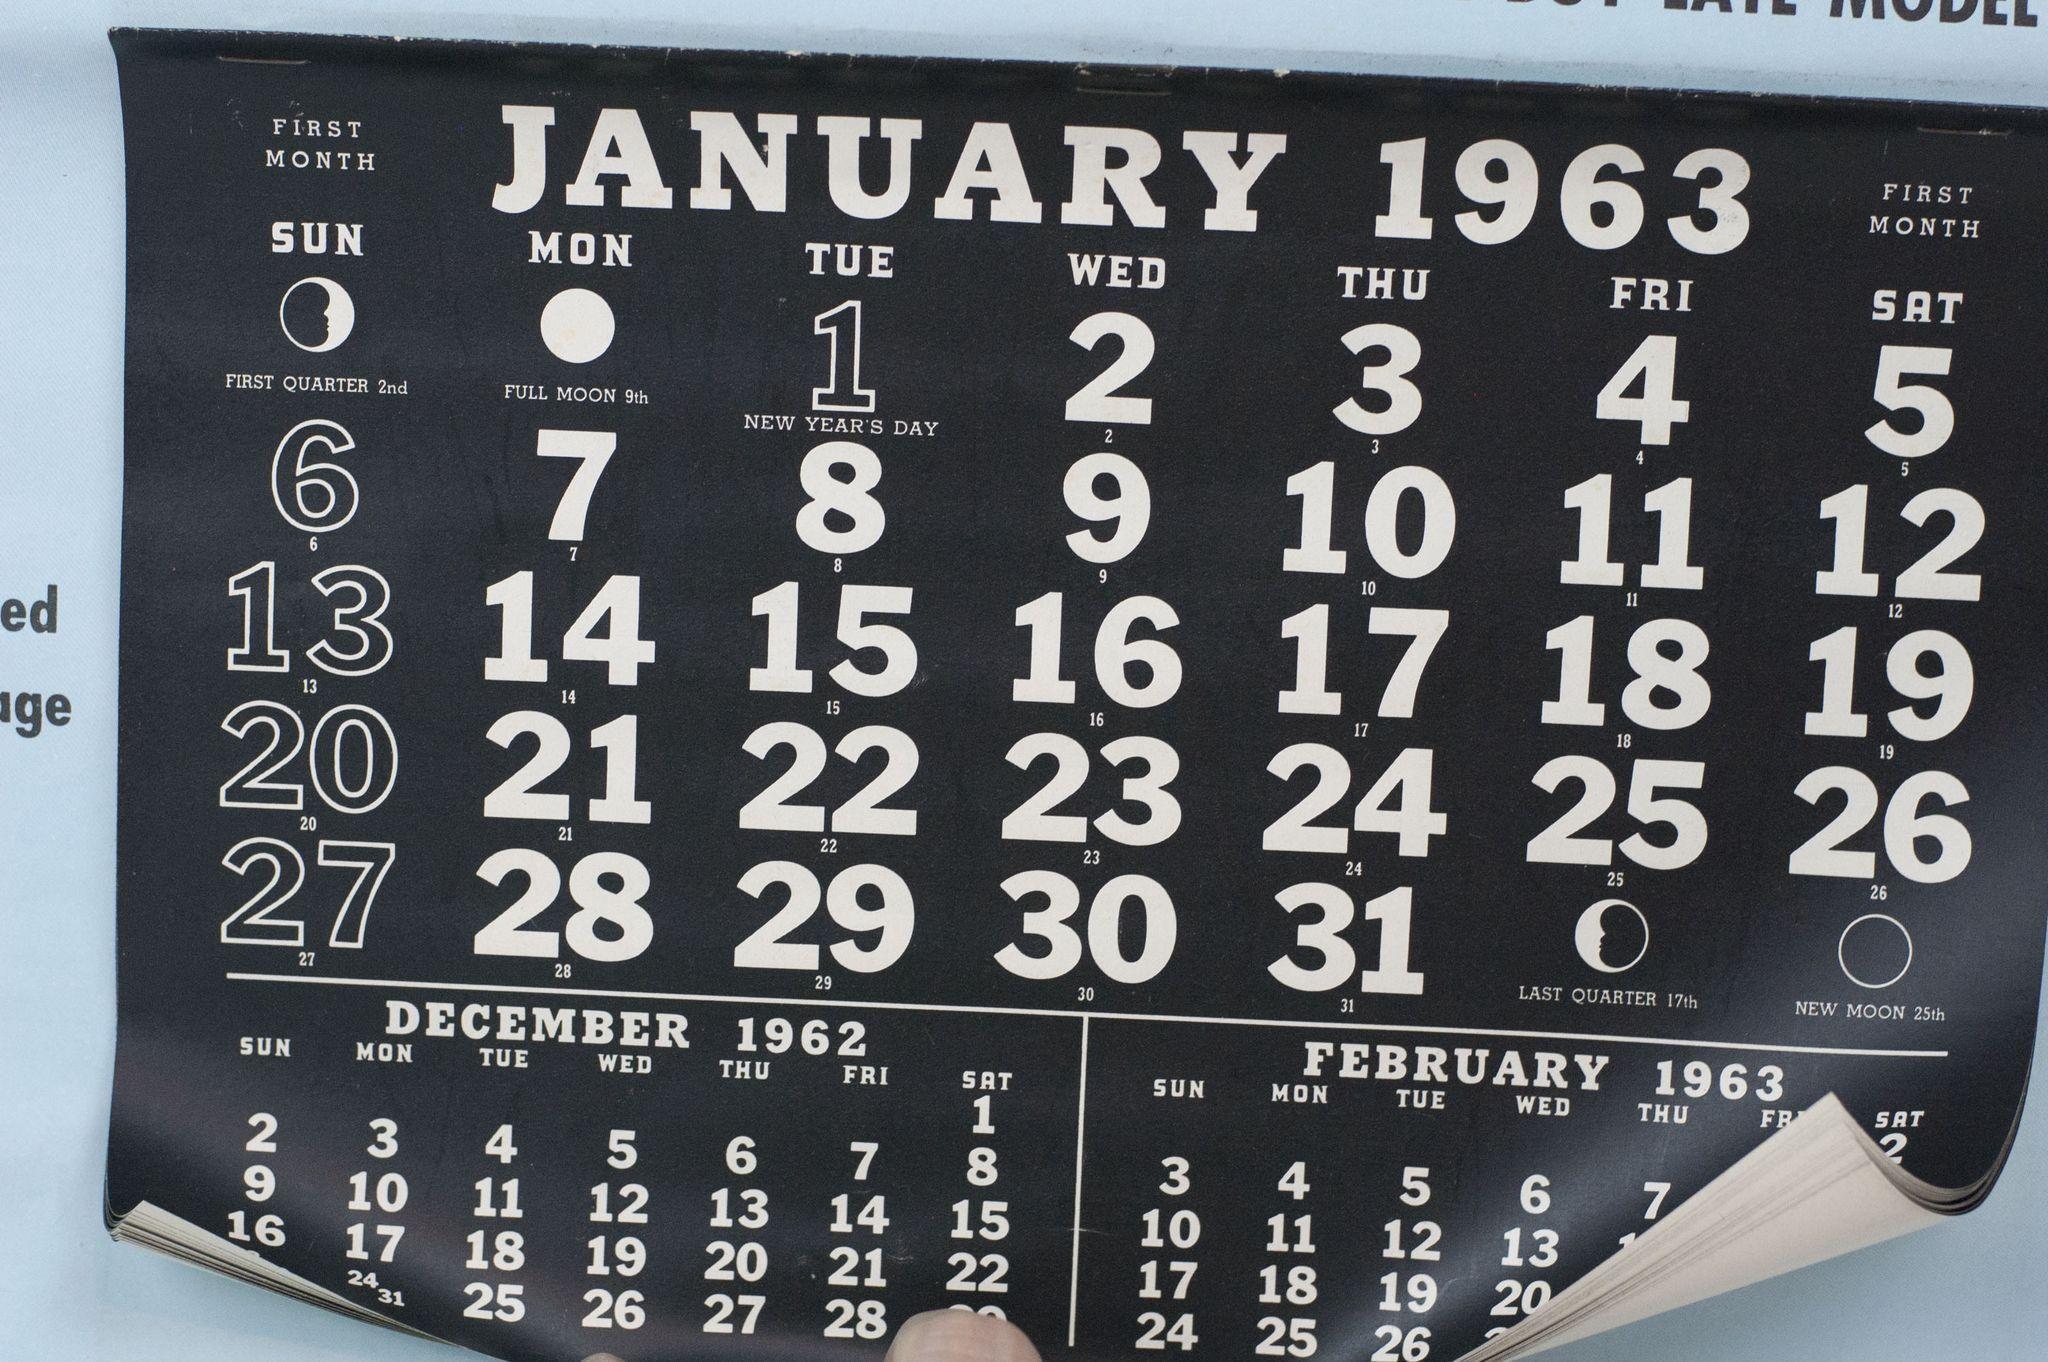 january 1963 calinder hi rez 2048 1362 morning coffee apple